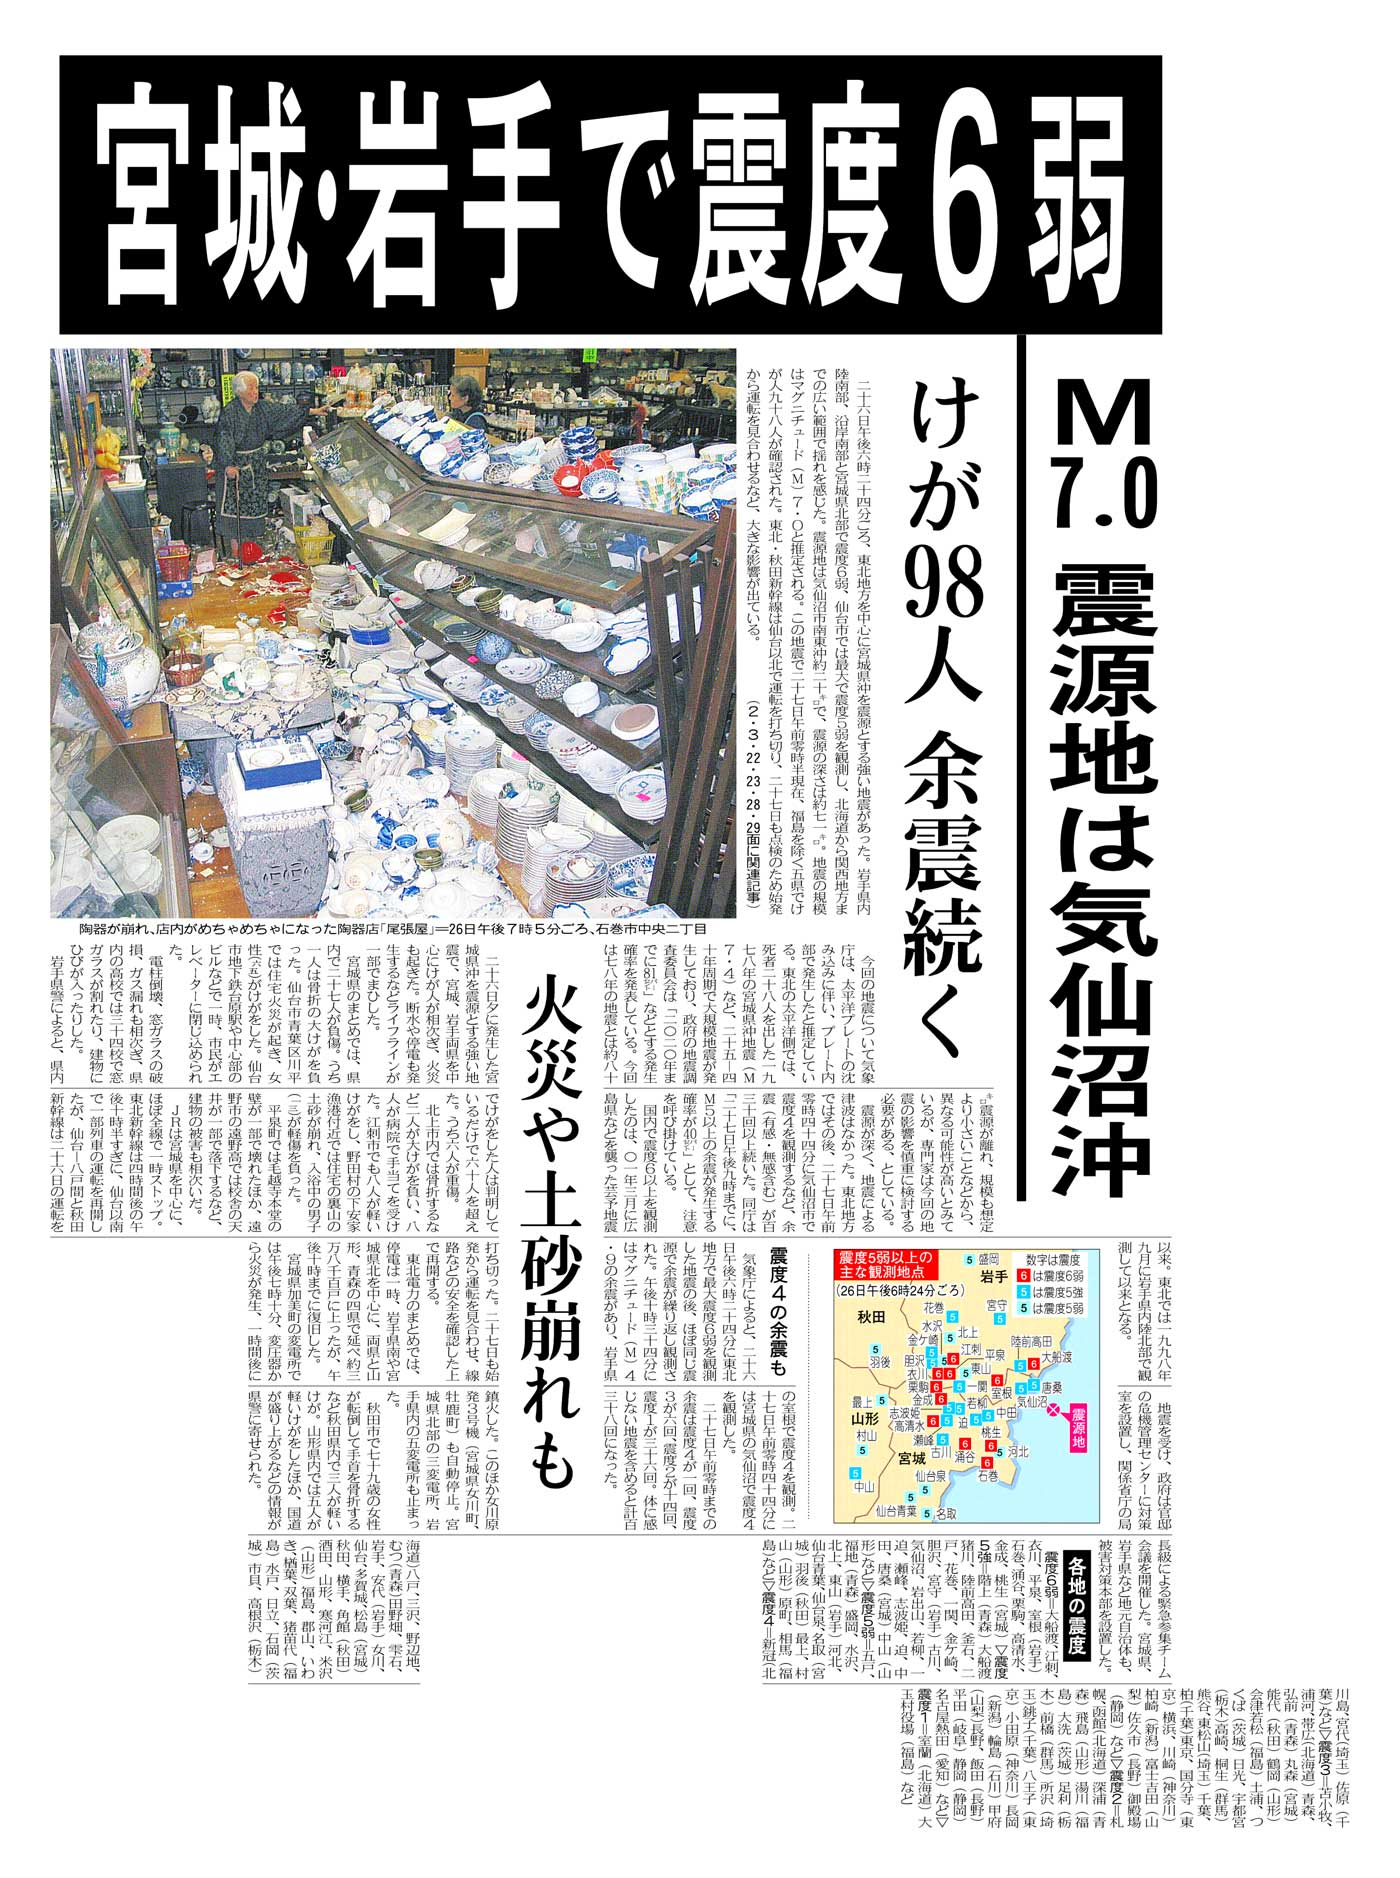 宮城県沖の地震(2003年)